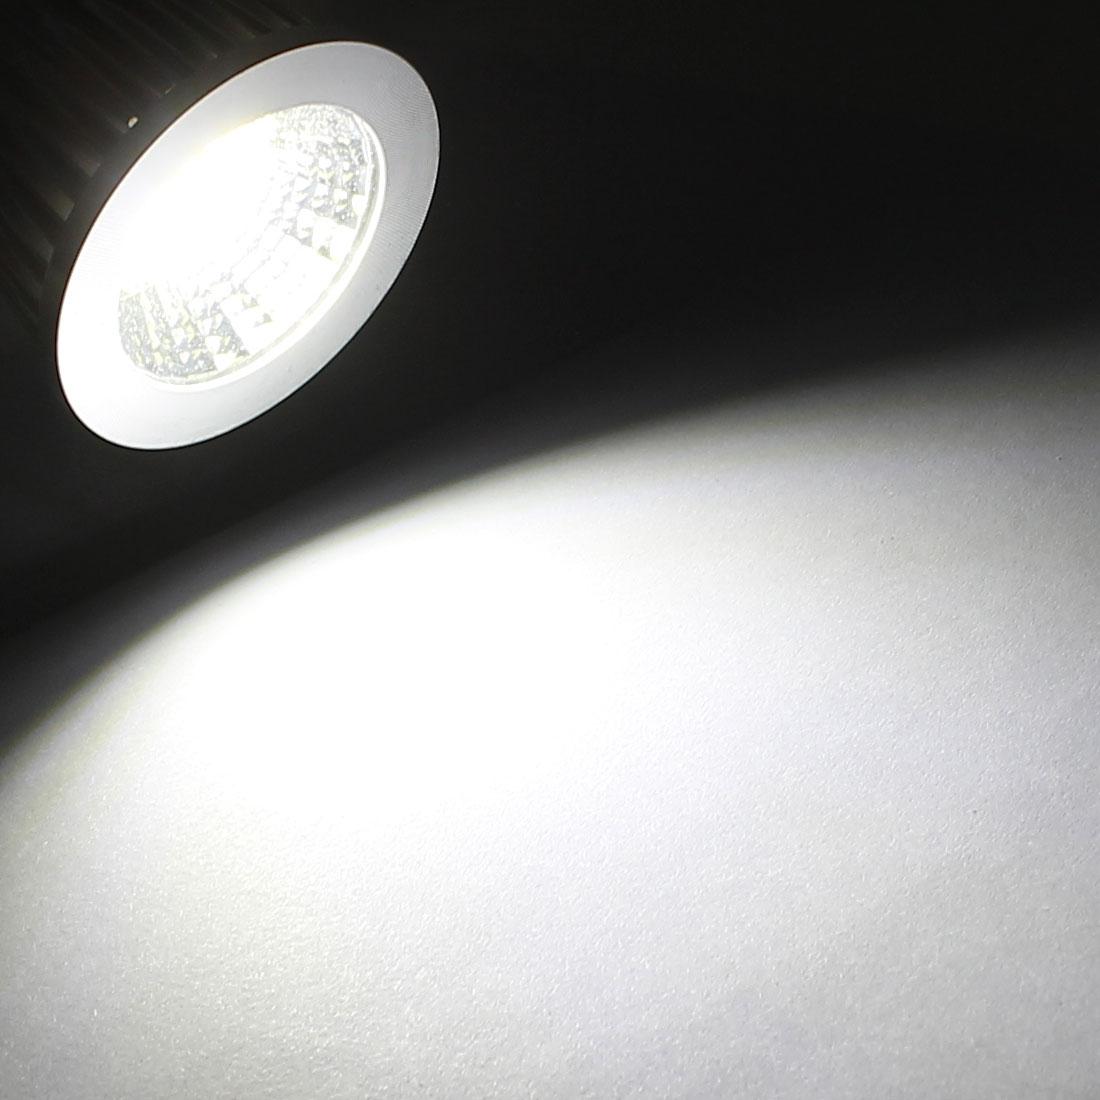 AC85-265V-5W-Bright-GU10-COB-LED-Spot-Down-Light-Lamp-Energy-Saving-Pure-White